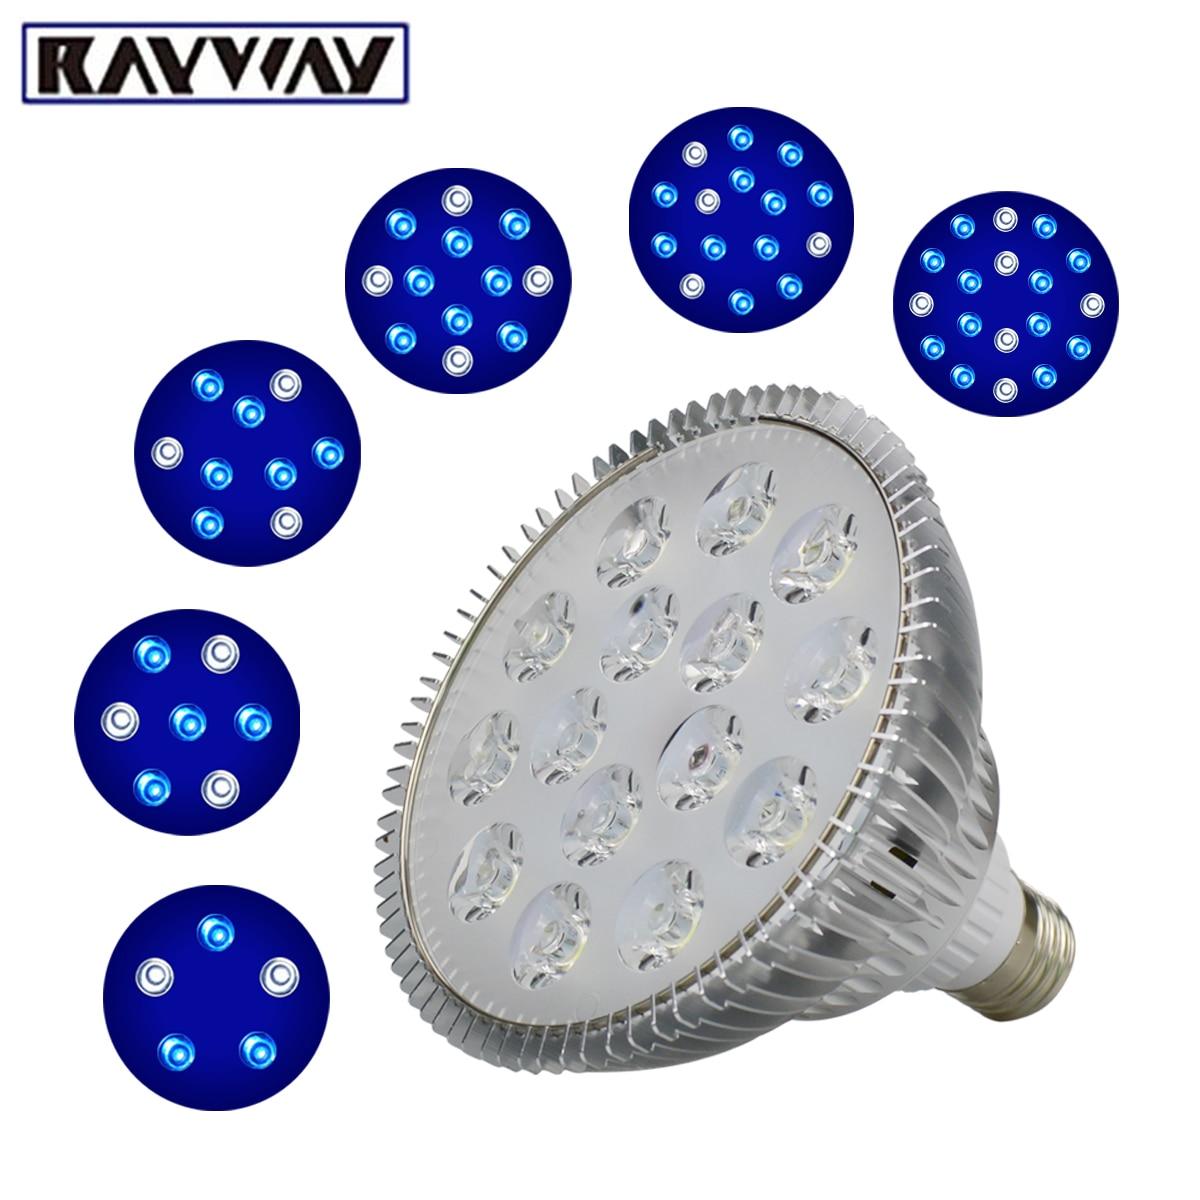 UV IR Red 54W LED Aquarium Light Led Pet Lighting Fish Tank Lamp Plant Bulb For Saltwater Marine Coral Reef Sump Algae